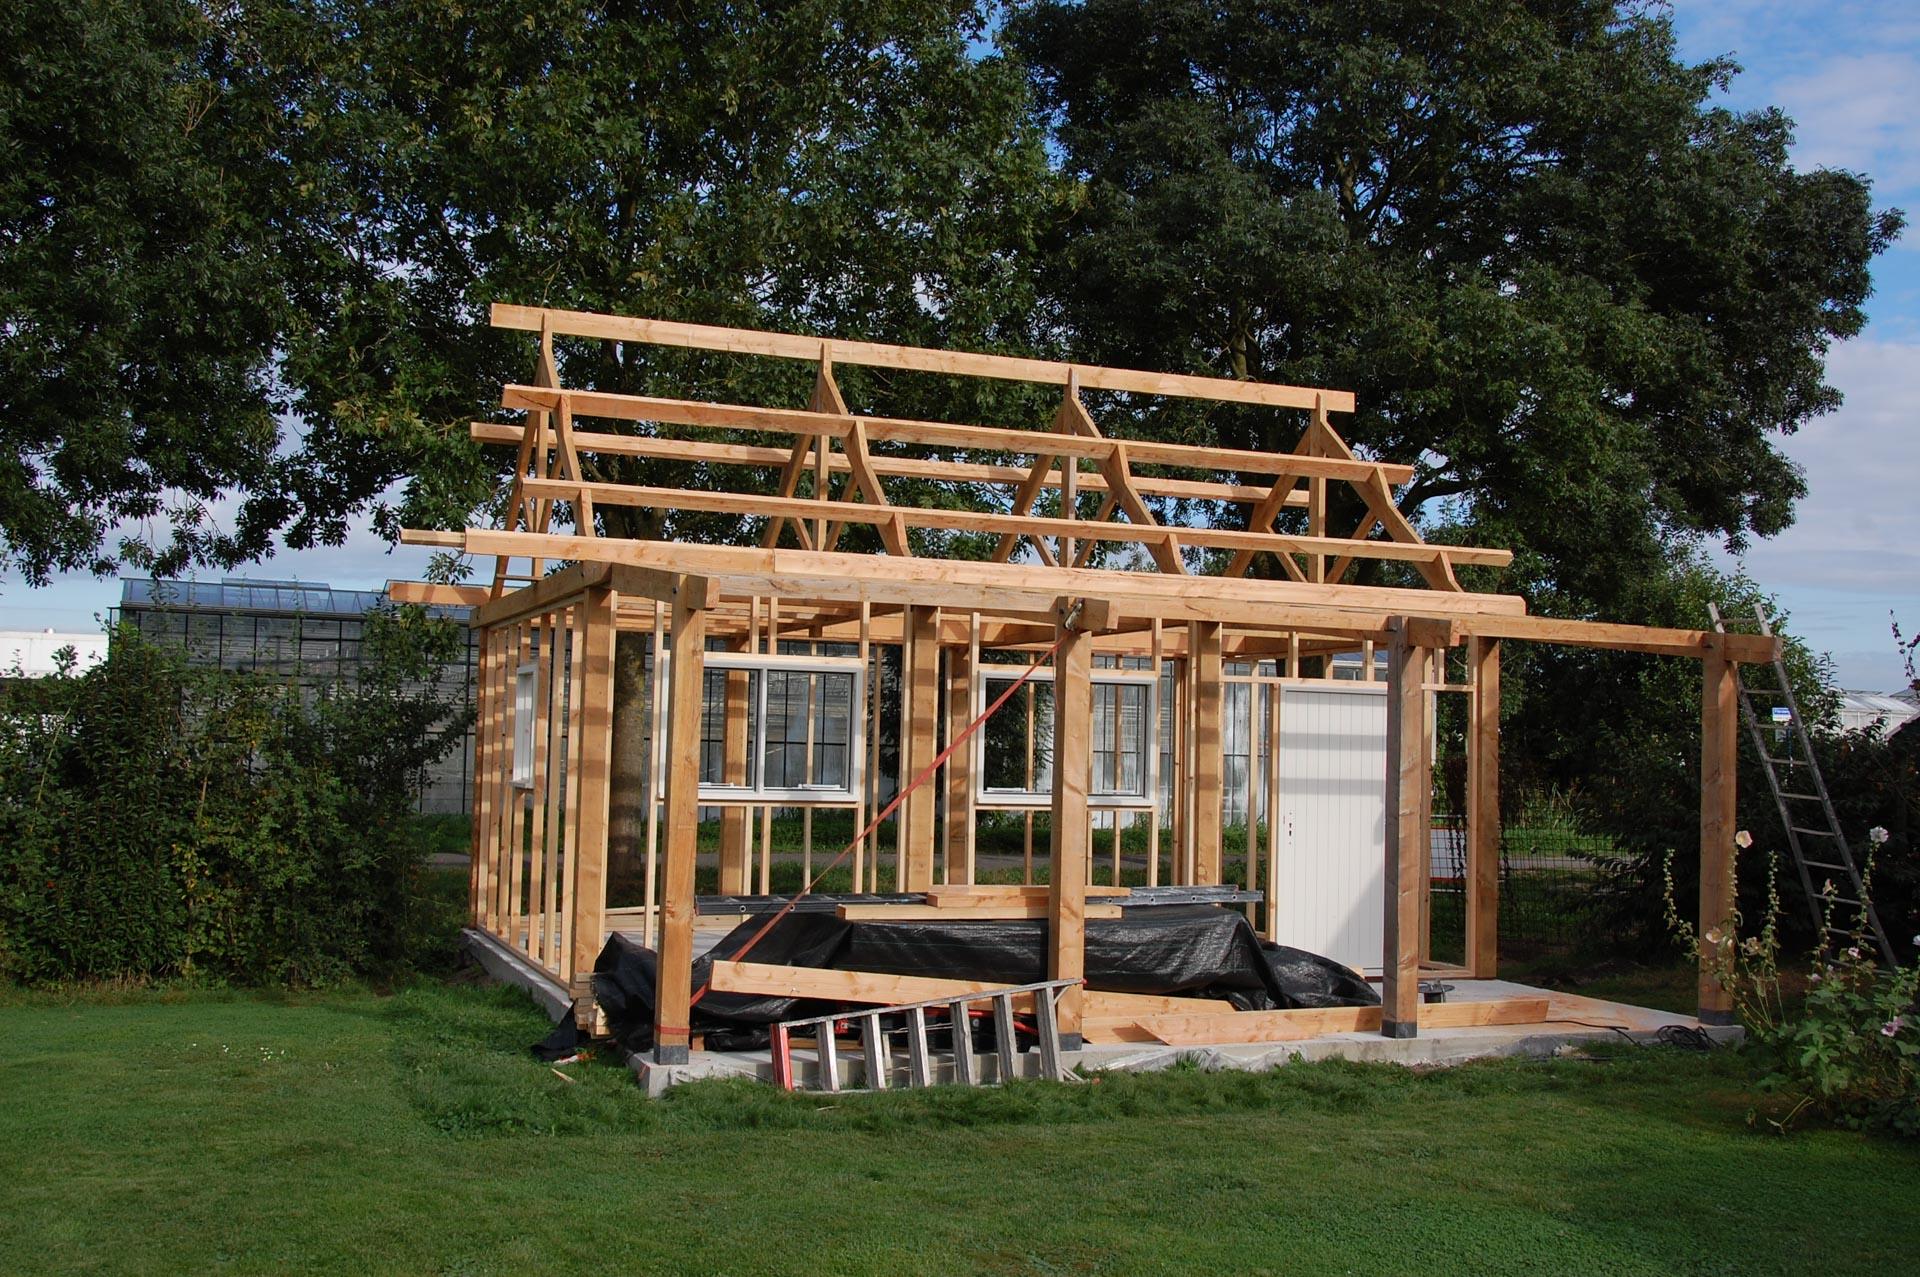 vos-hoveniers-project-tuinhuis-1